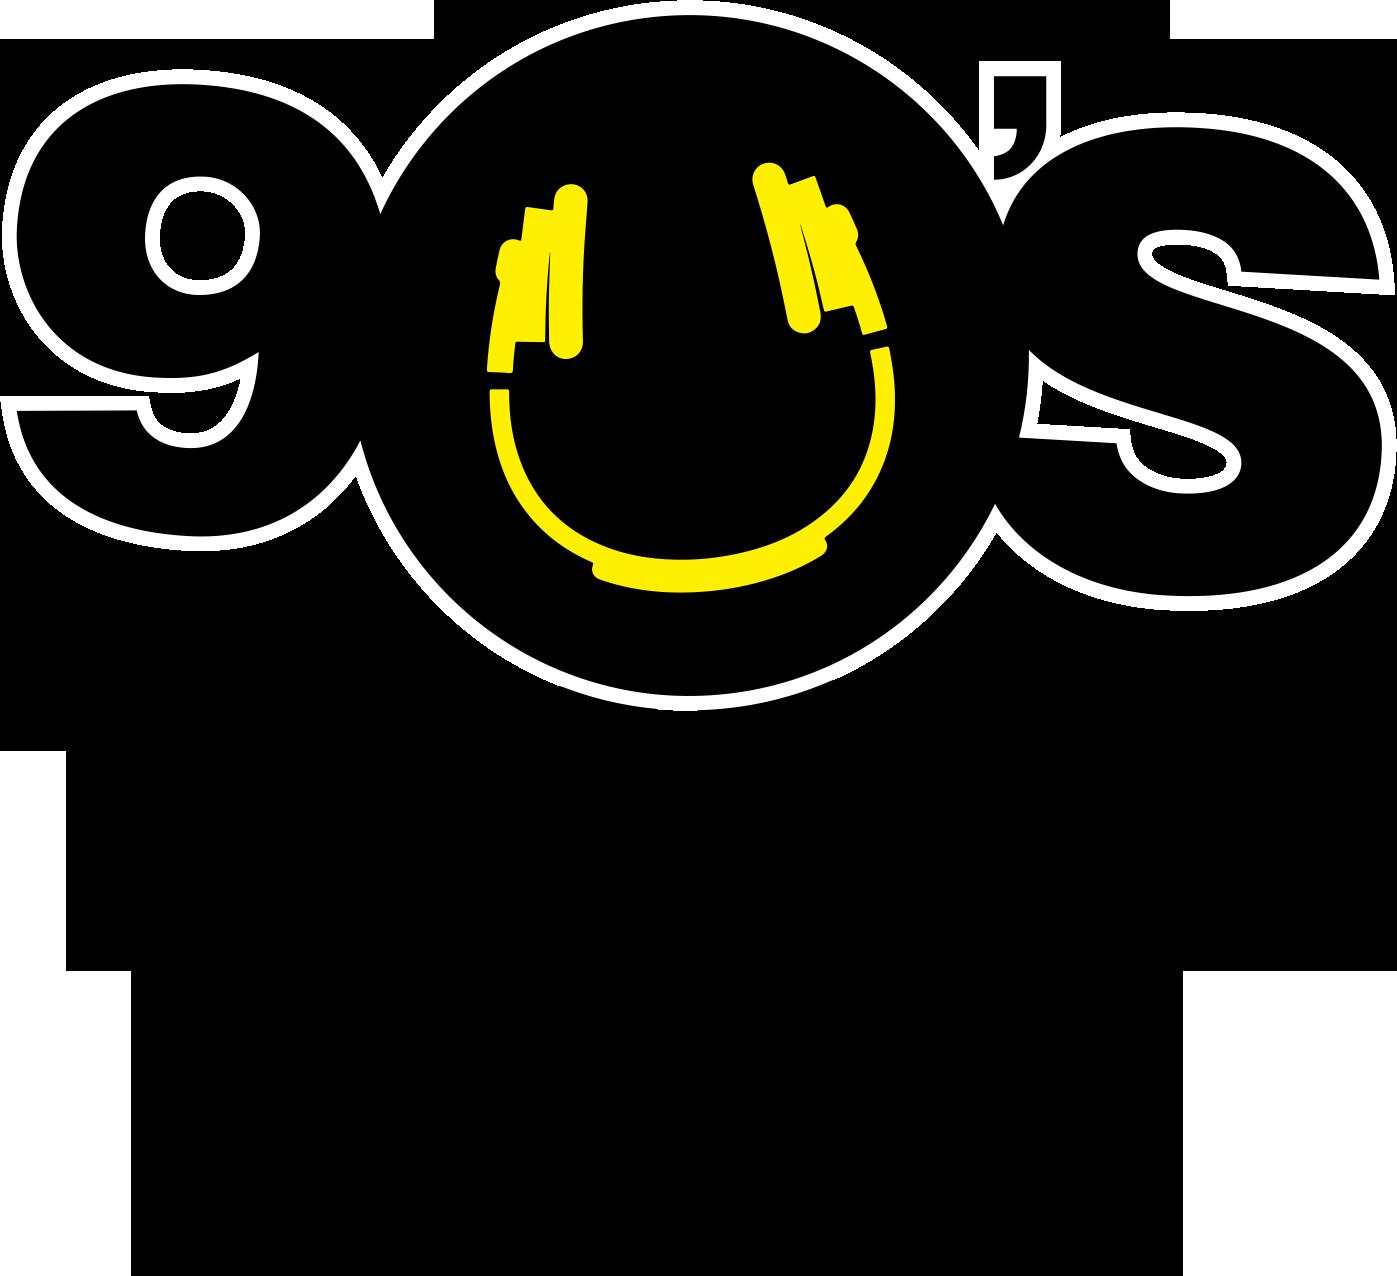 90s Fest Halloween